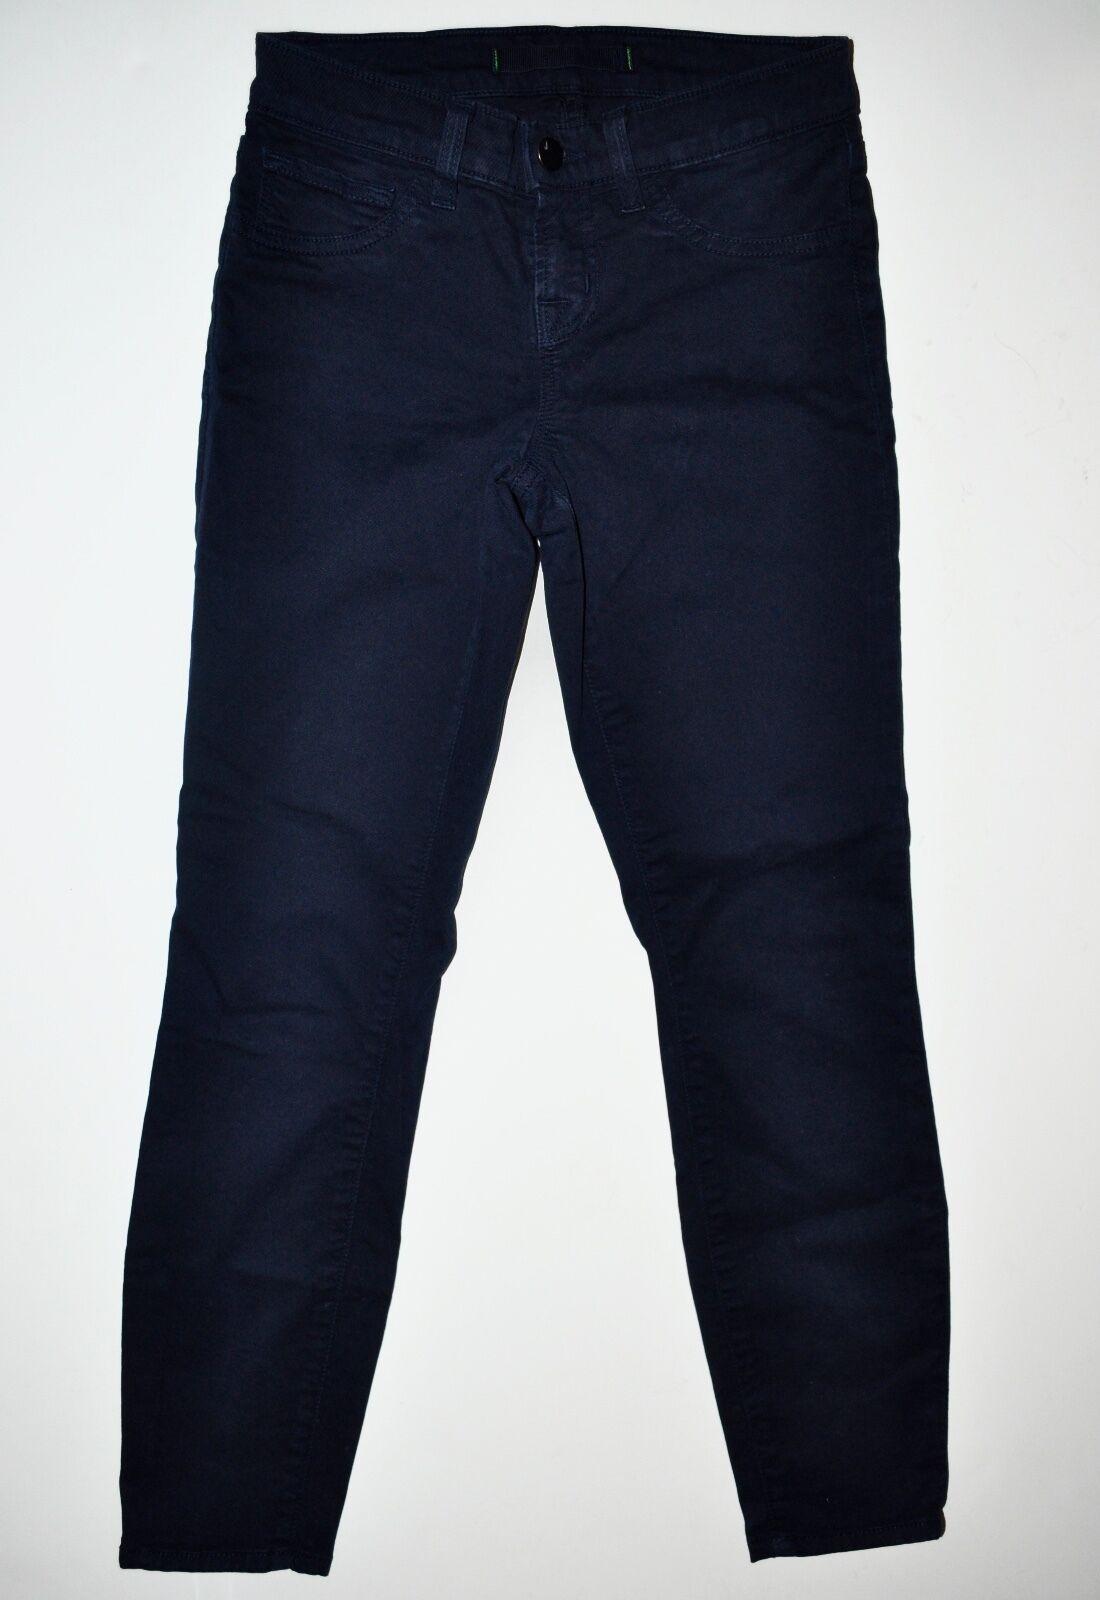 J Brand Low Rise Skinny Capri Cropped Jeans in Marine Size 23